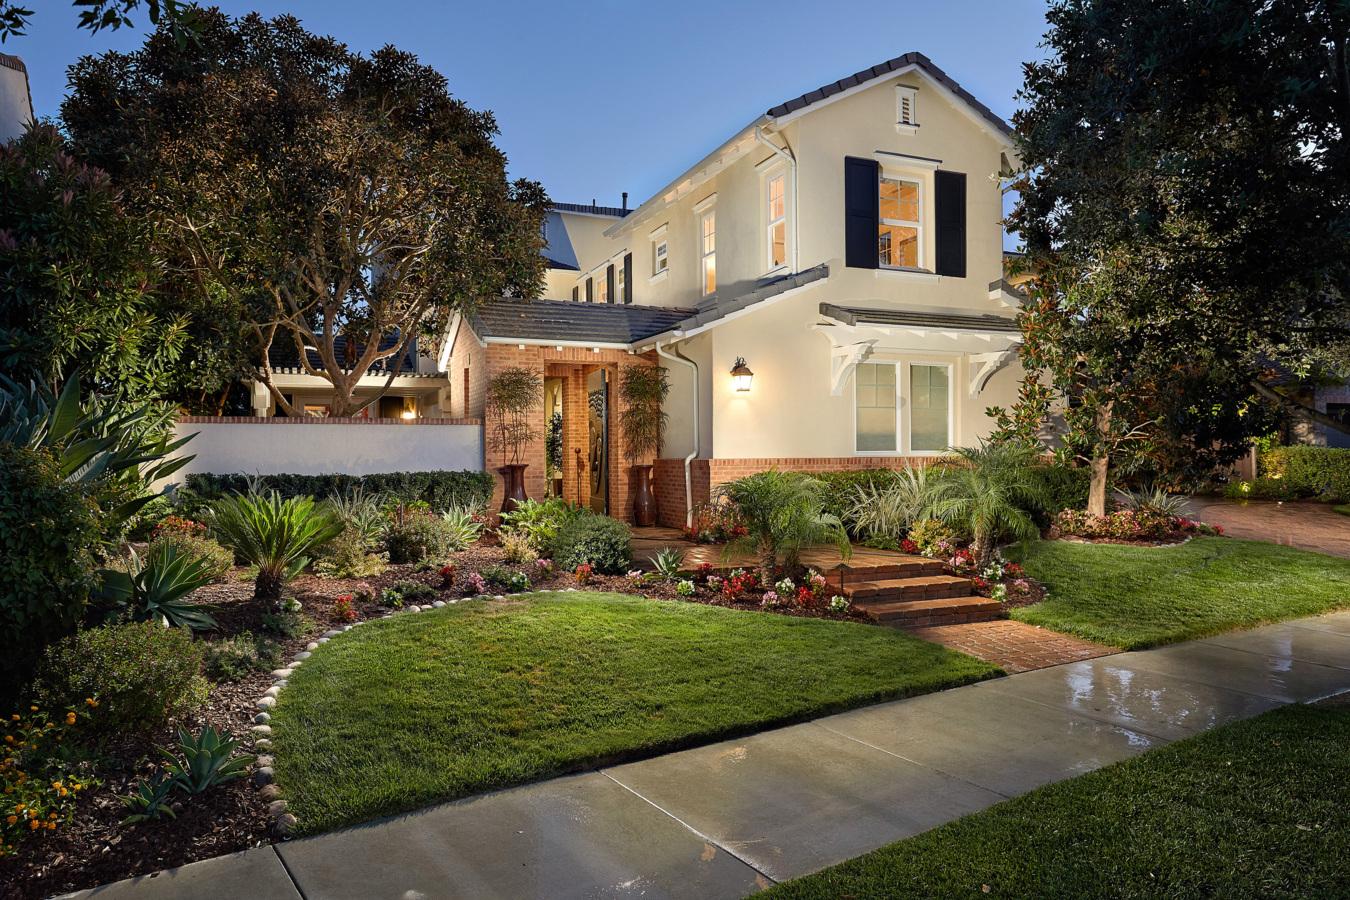 3223 Corte Paloma, Carlsbad, San Diego County, CA - Home for Sale ...